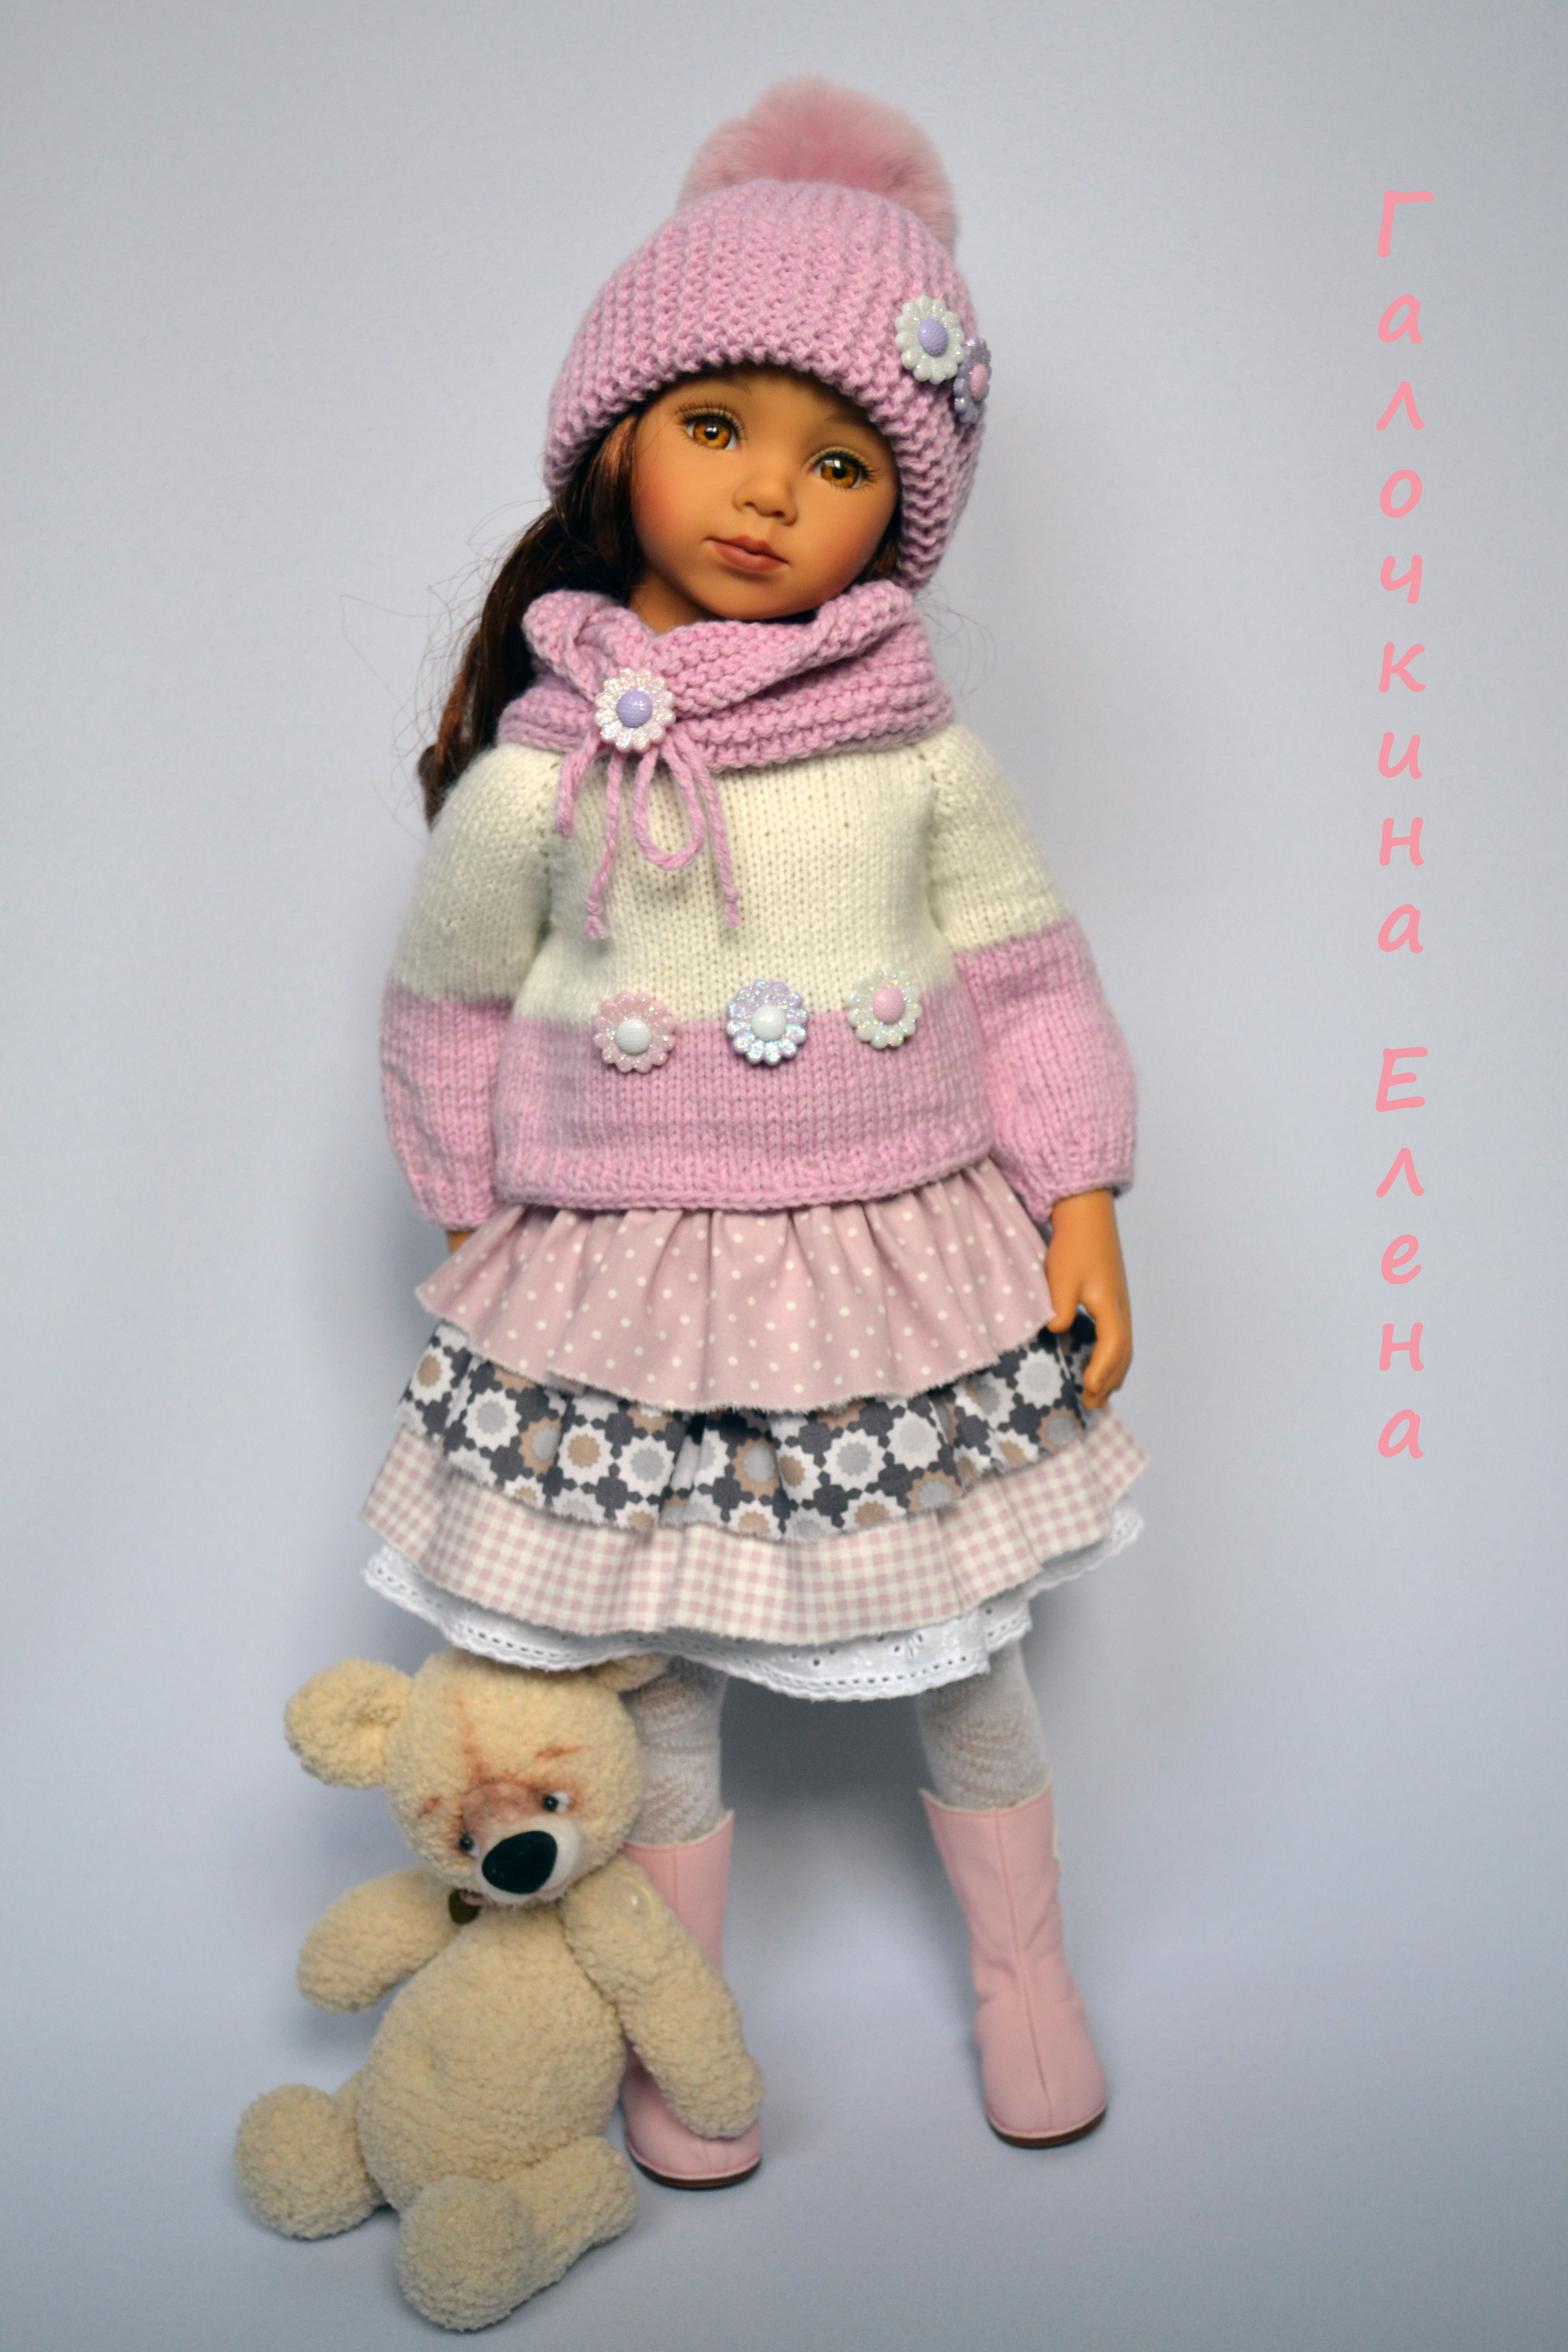 Pin de Carmen M. Cerda en Lindas muñecas | Pinterest | Muñecas ...